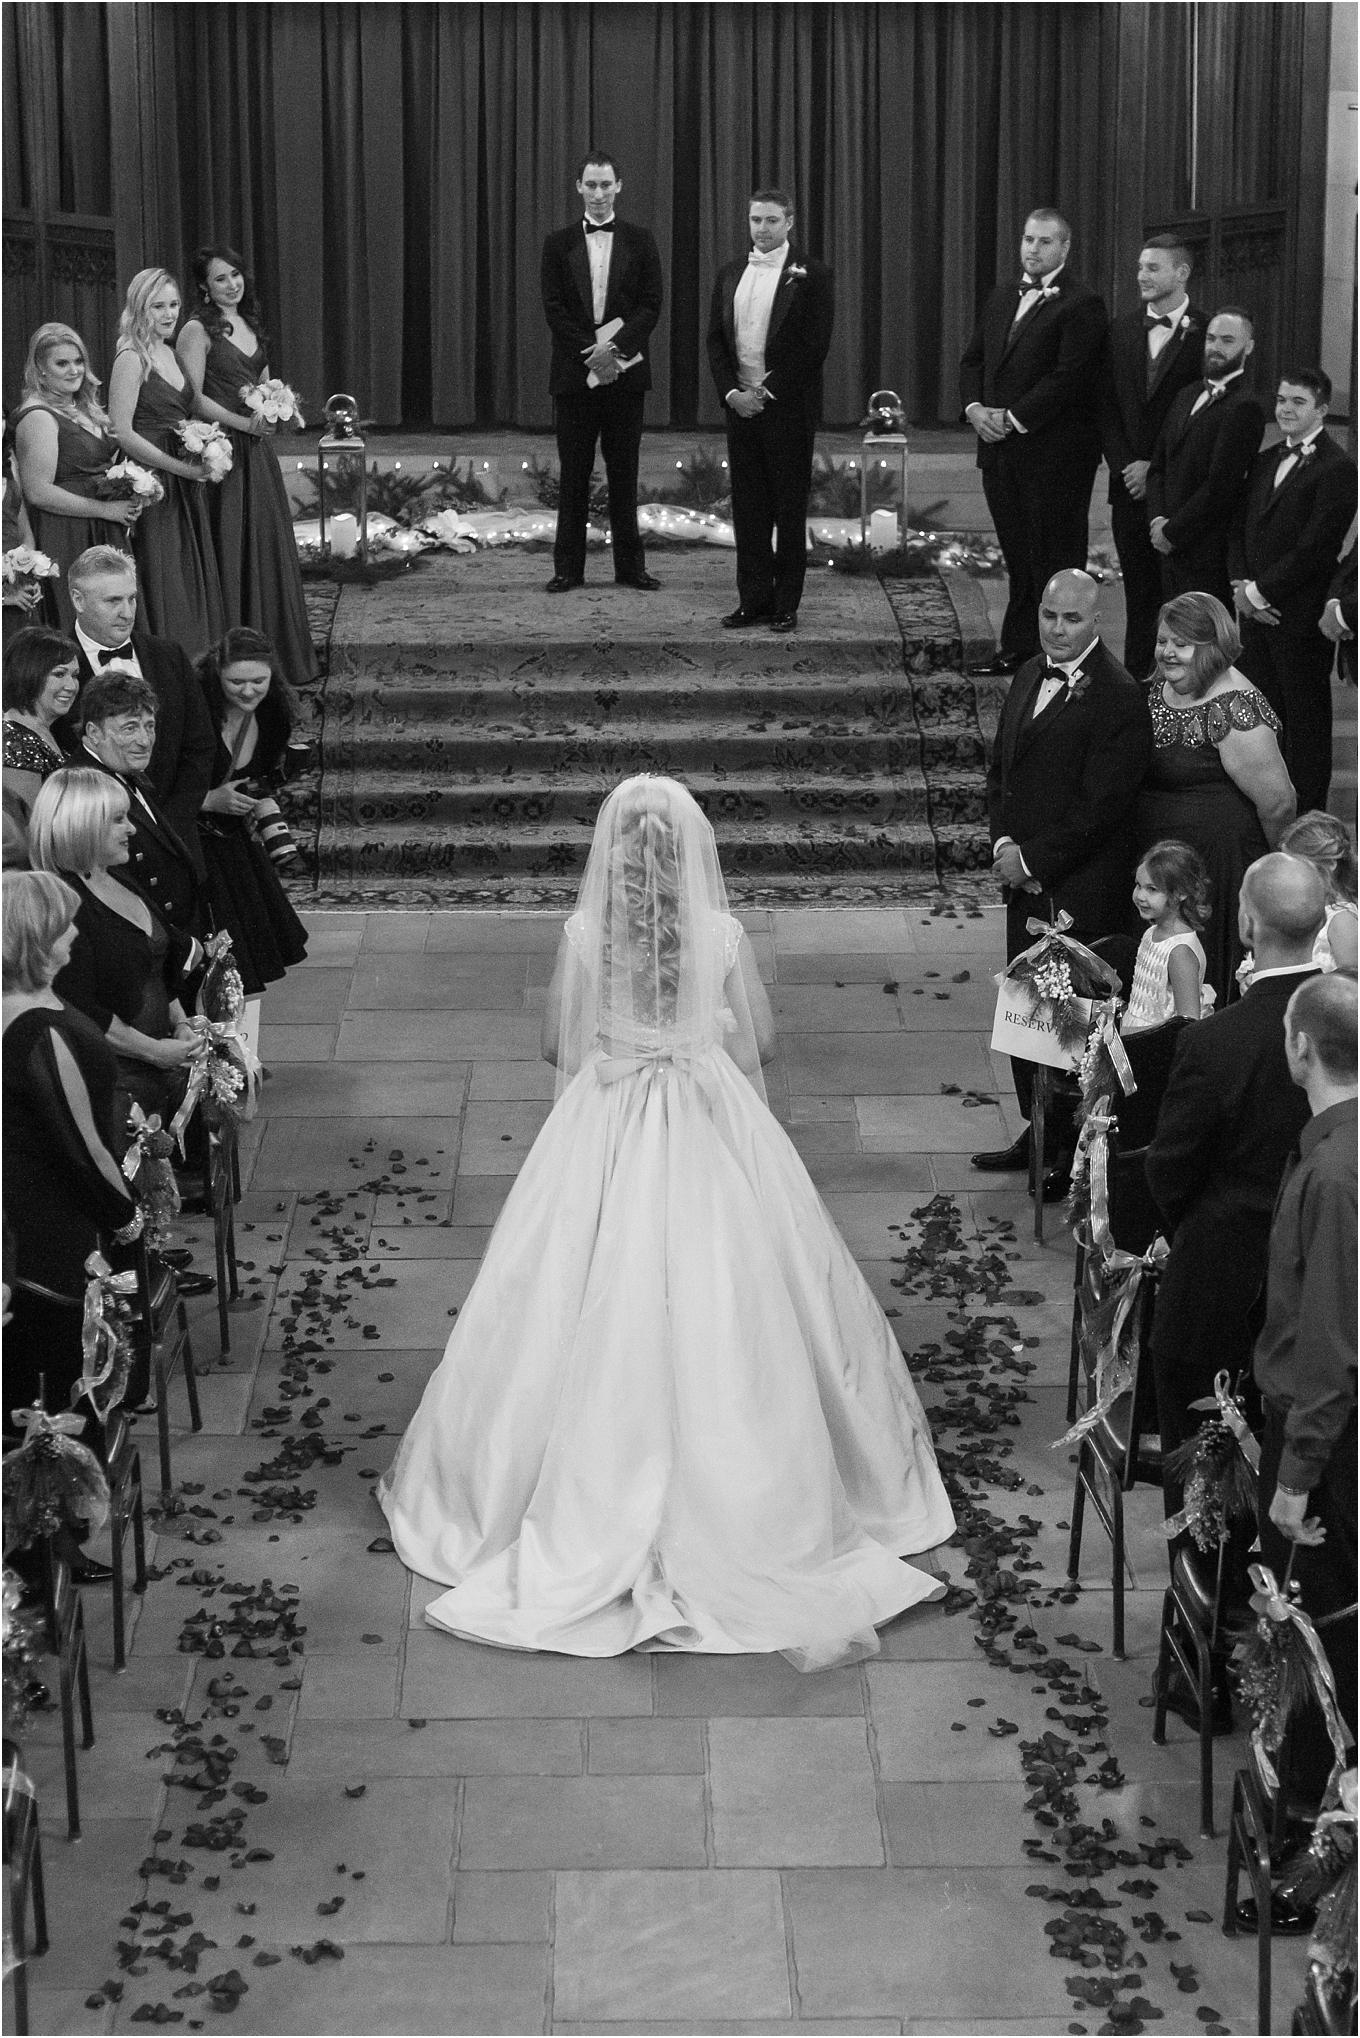 elegant-classic-fairytale-wedding-photos-in-detroit-mi-at-the-masonic-temple-by-courtney-carolyn-photography_0097.jpg